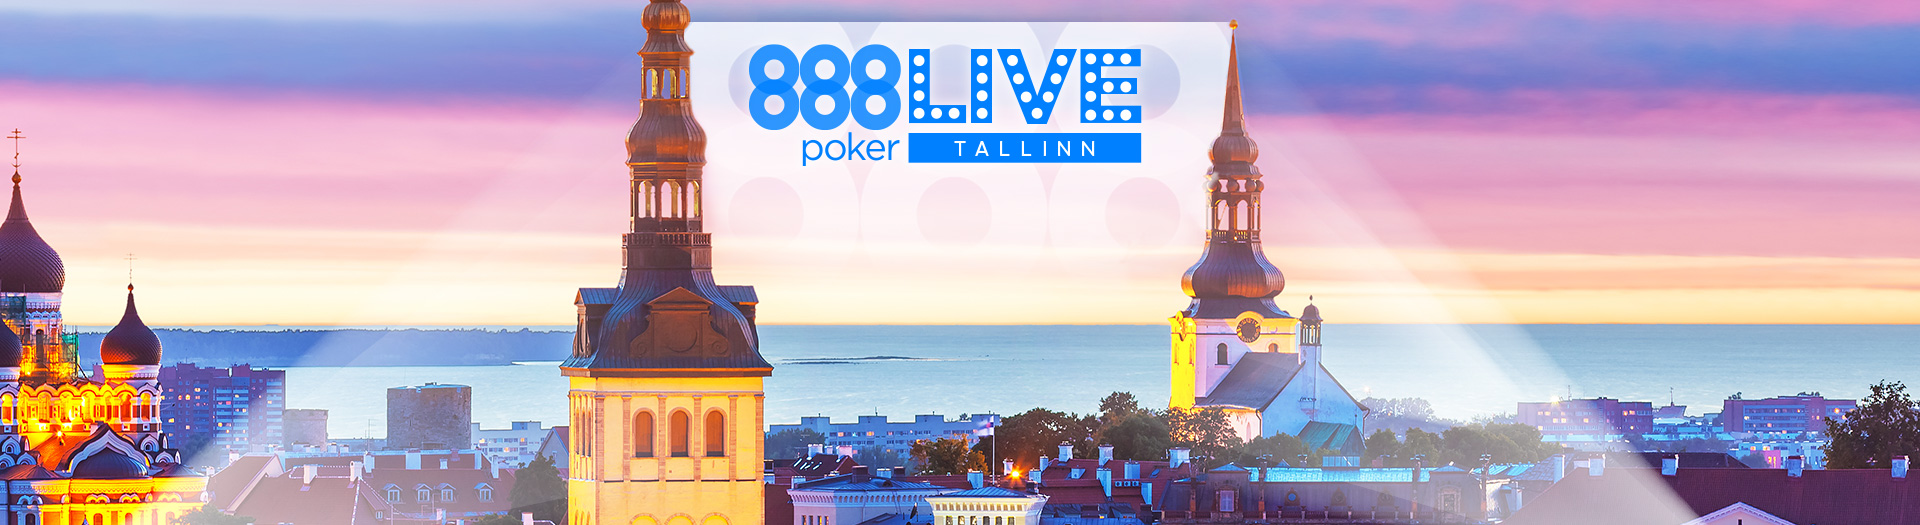 888 poker europe